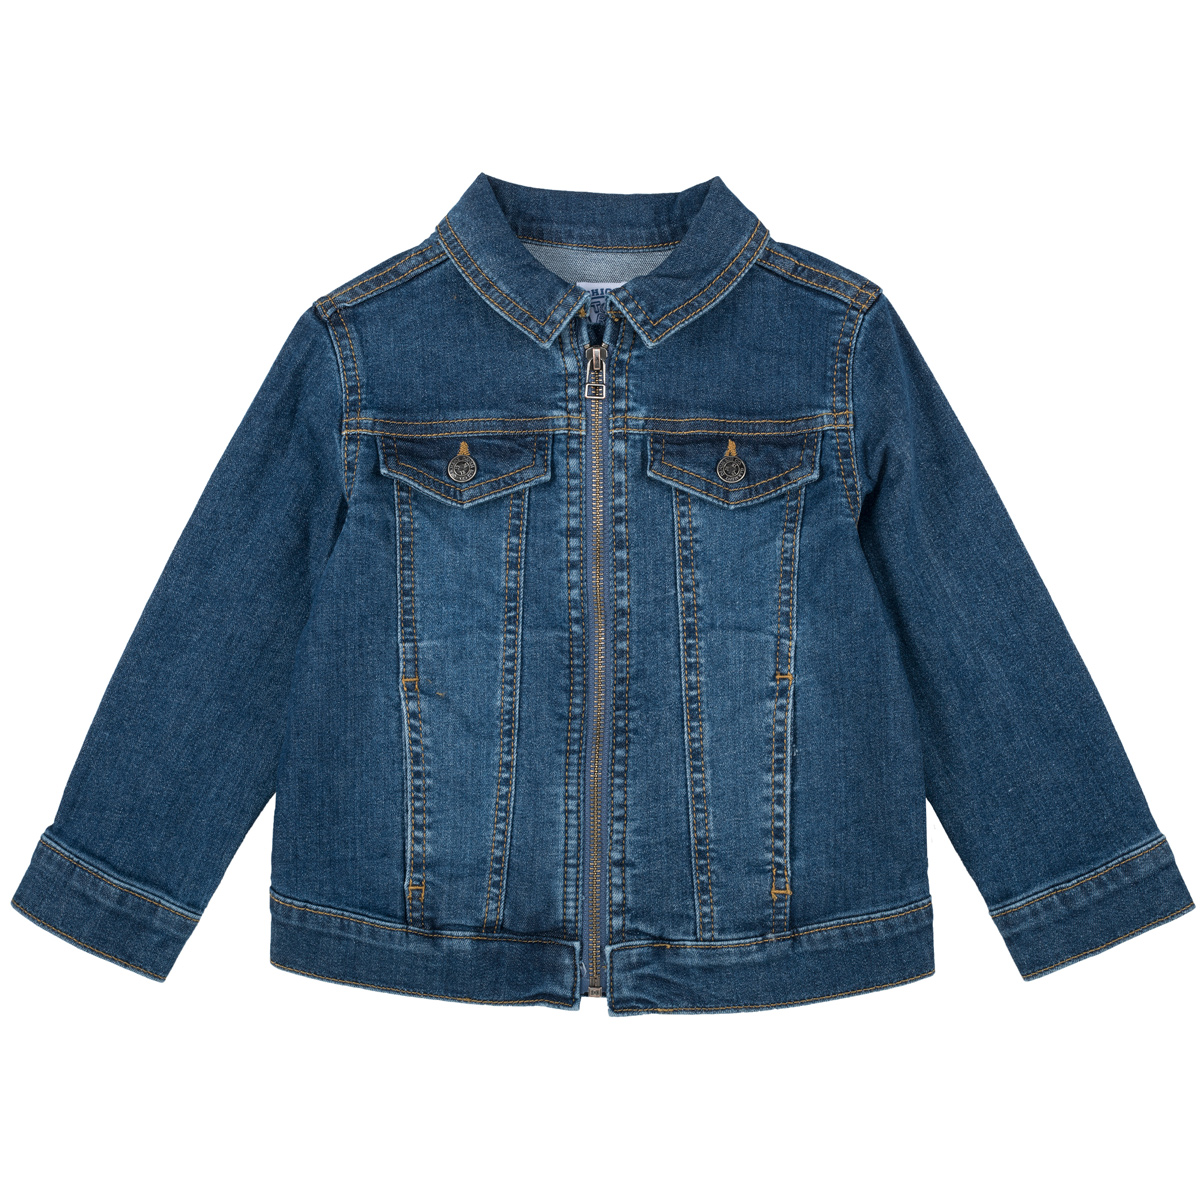 Jacheta copii Chicco, albastru denim, 87396 din categoria Jachete copii